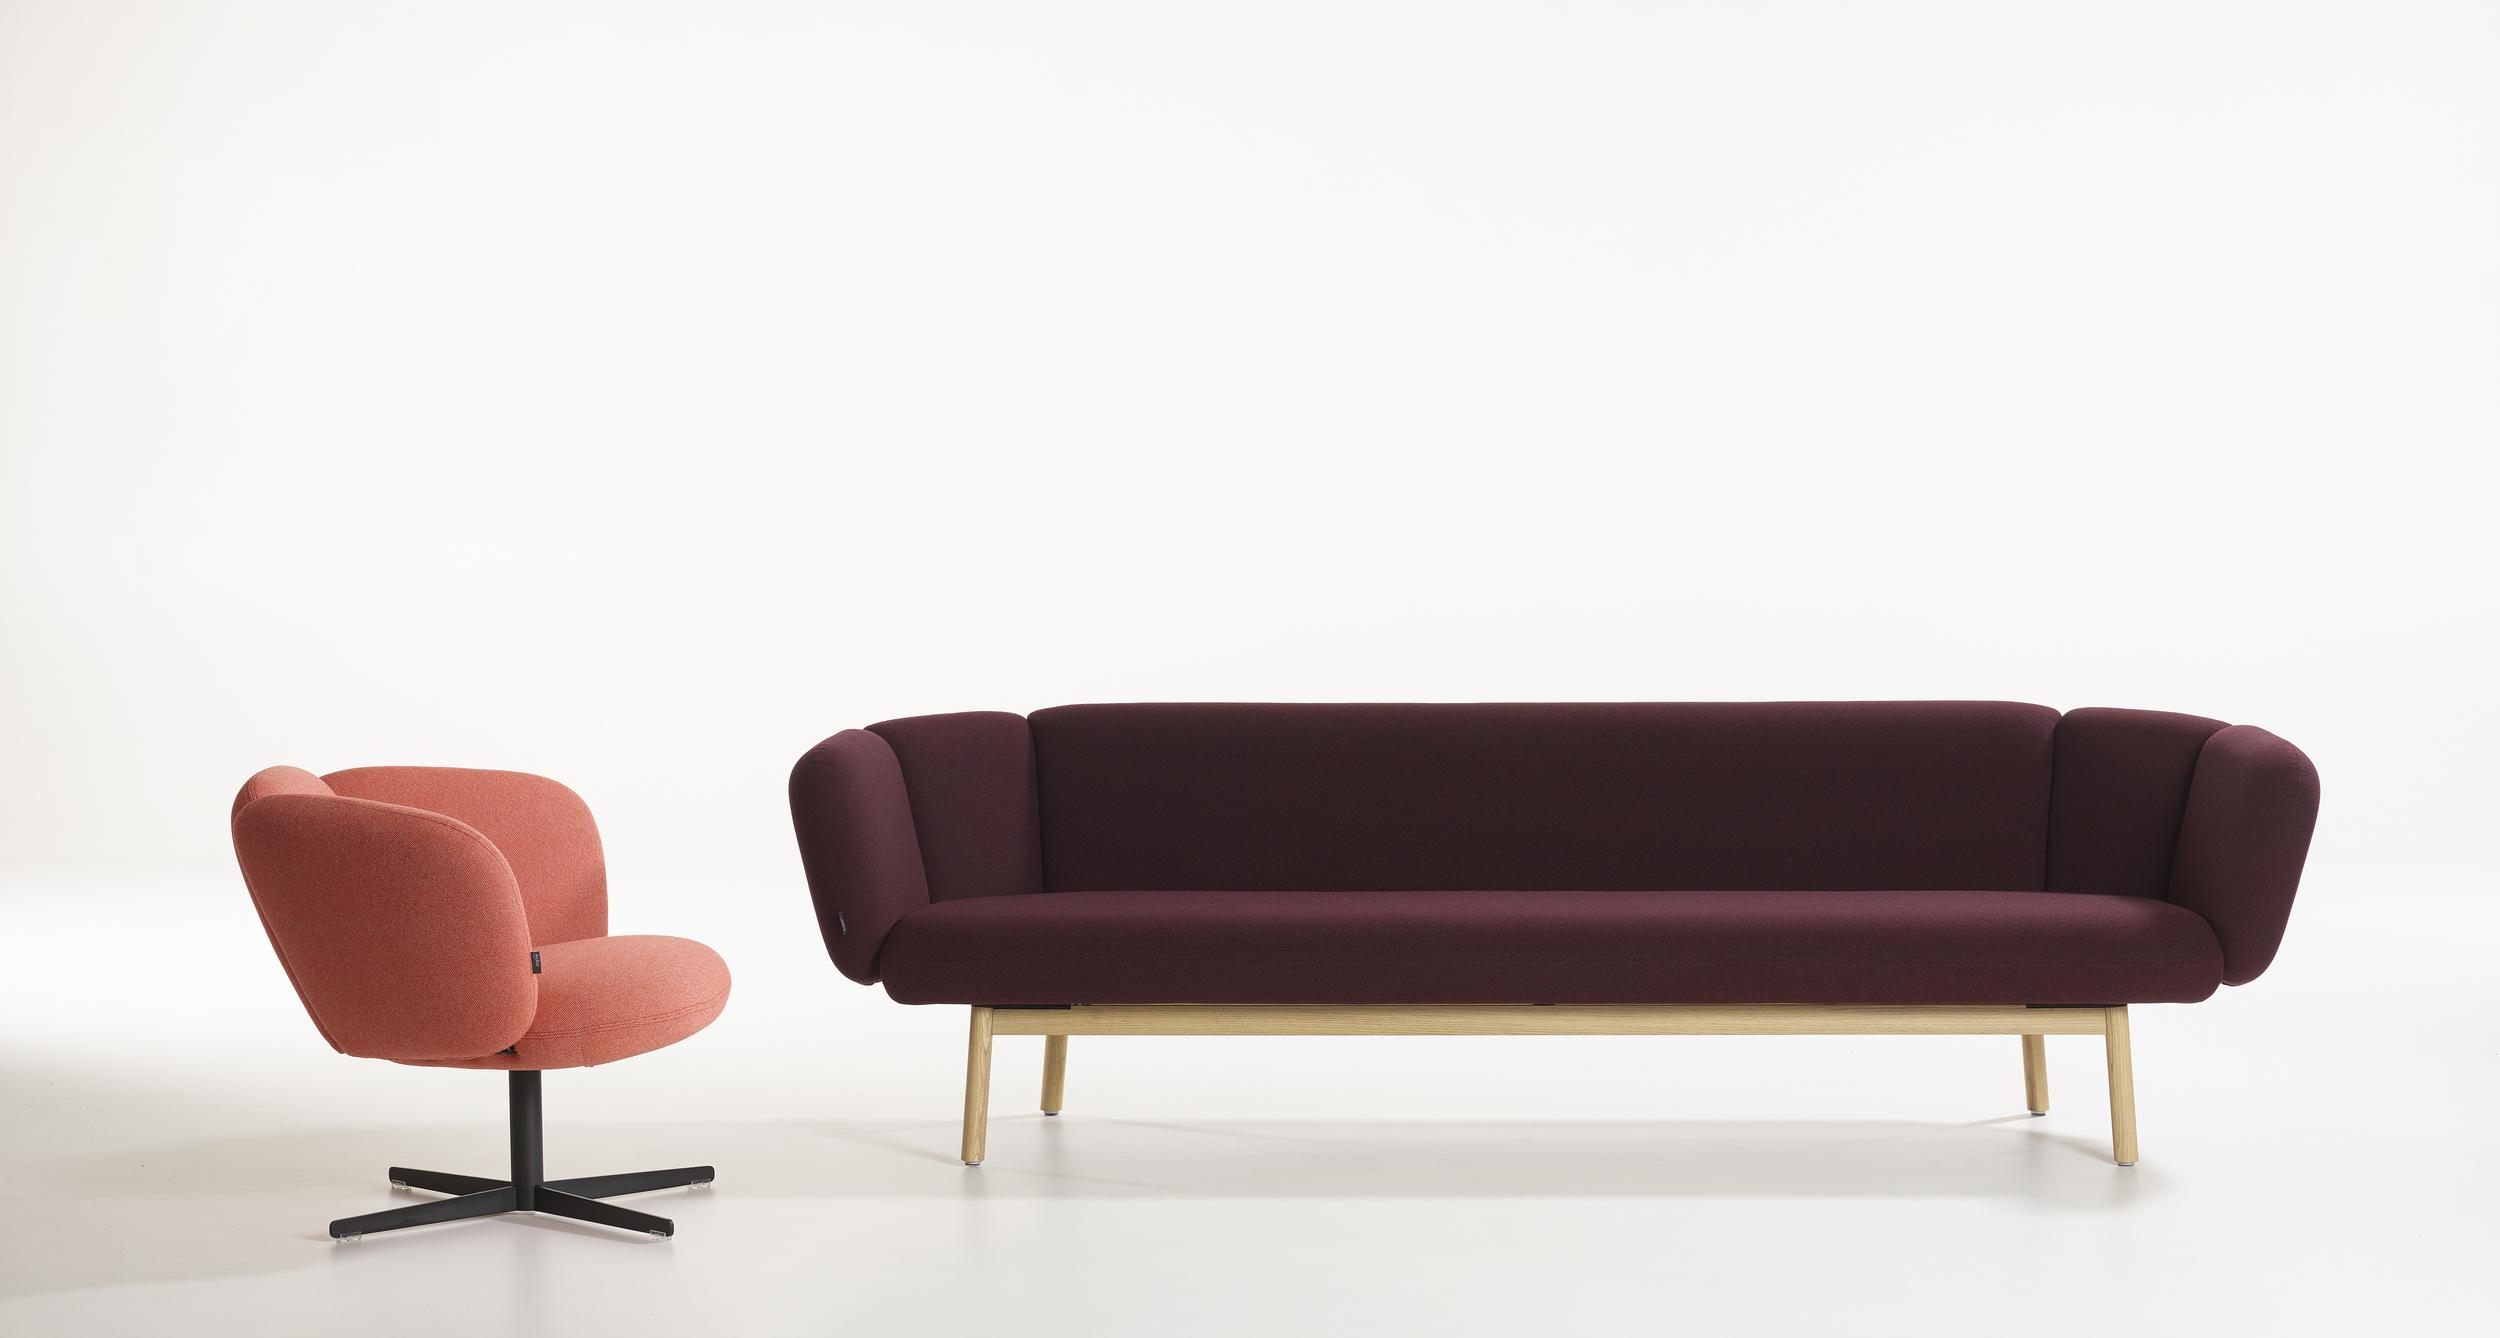 Bras sofa from Artifort